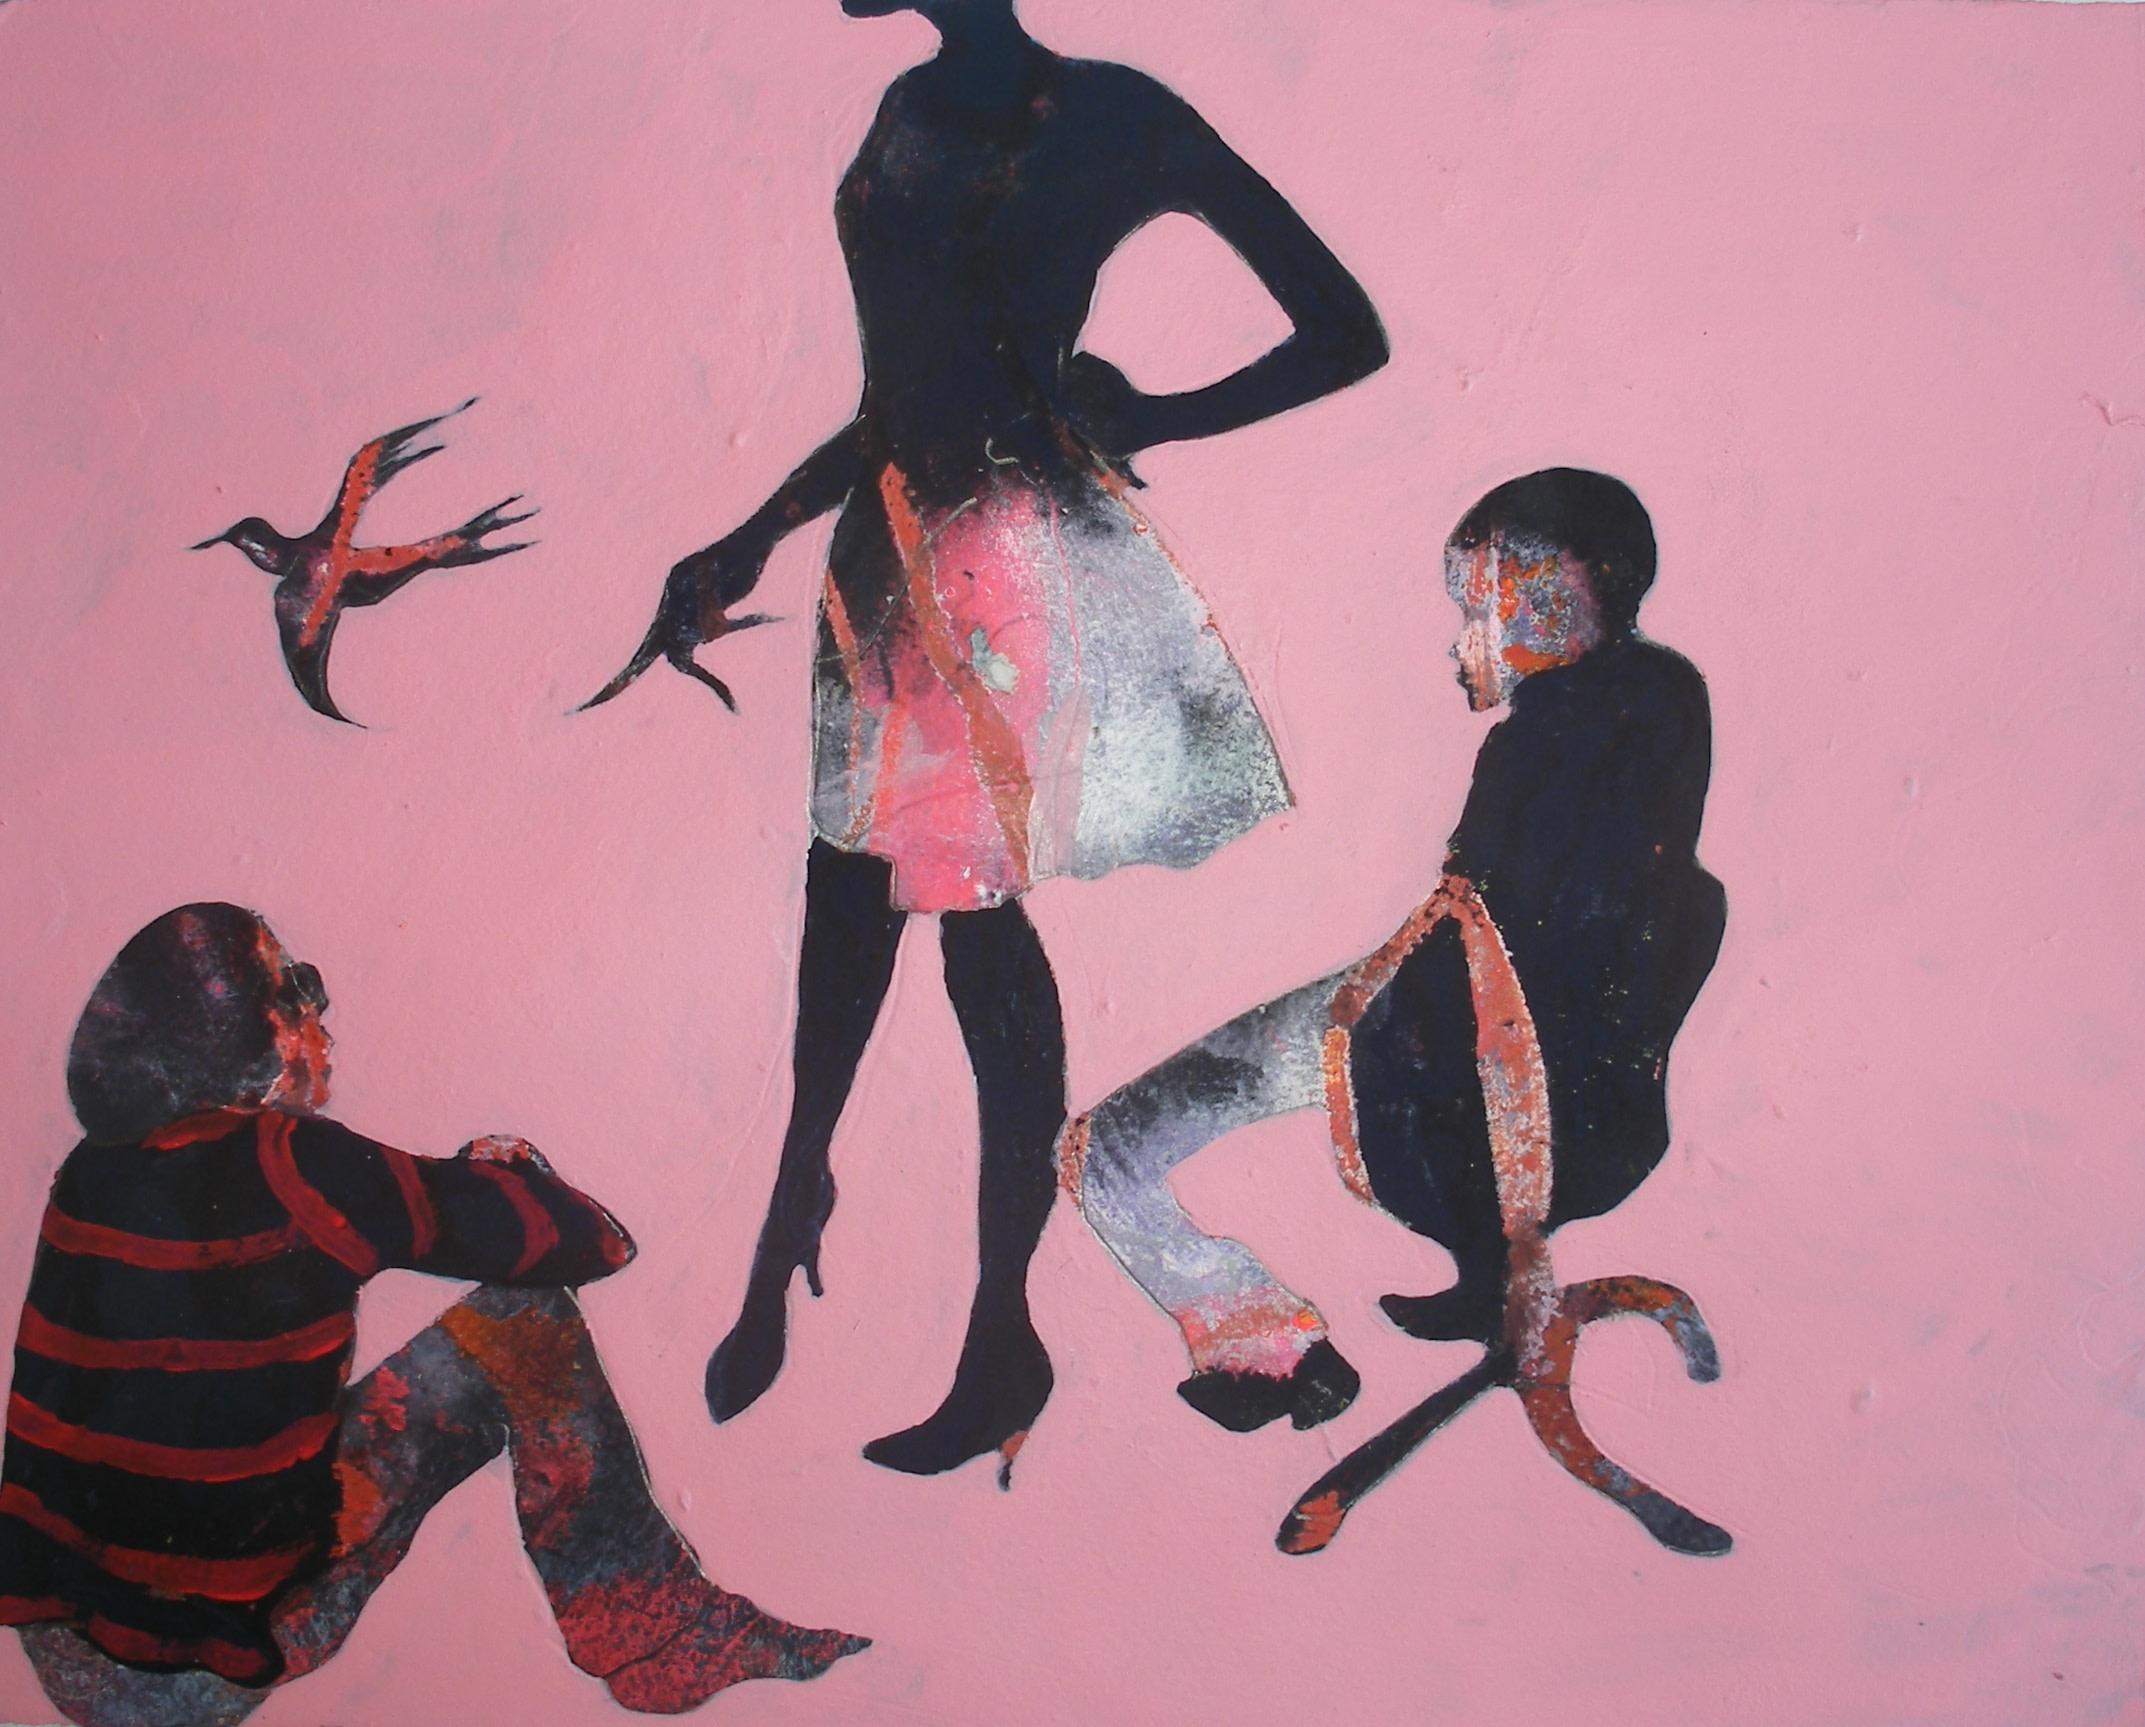 "<span class=""link fancybox-details-link""><a href=""/artists/72-jonathan-huxley/works/9539-jonathan-huxley-black-bird/"">View Detail Page</a></span><div class=""artist""><span class=""artist""><strong>Jonathan Huxley</strong></span></div><div class=""title""><em>Black Bird</em></div><div class=""medium"">watercolour</div><div class=""price"">£1,500.00</div>"